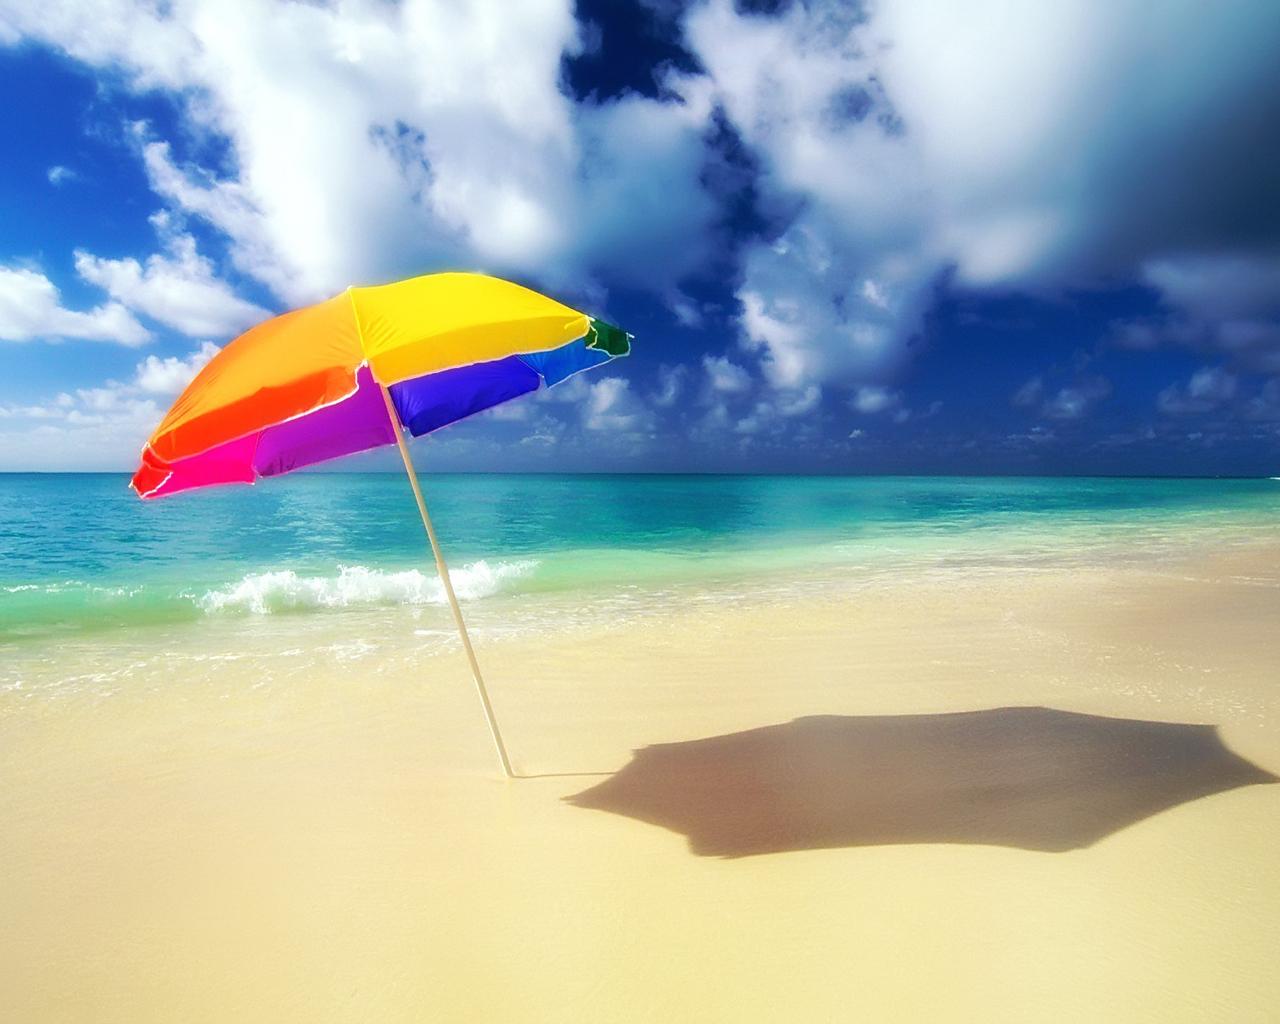 sun_umbrella.jpg